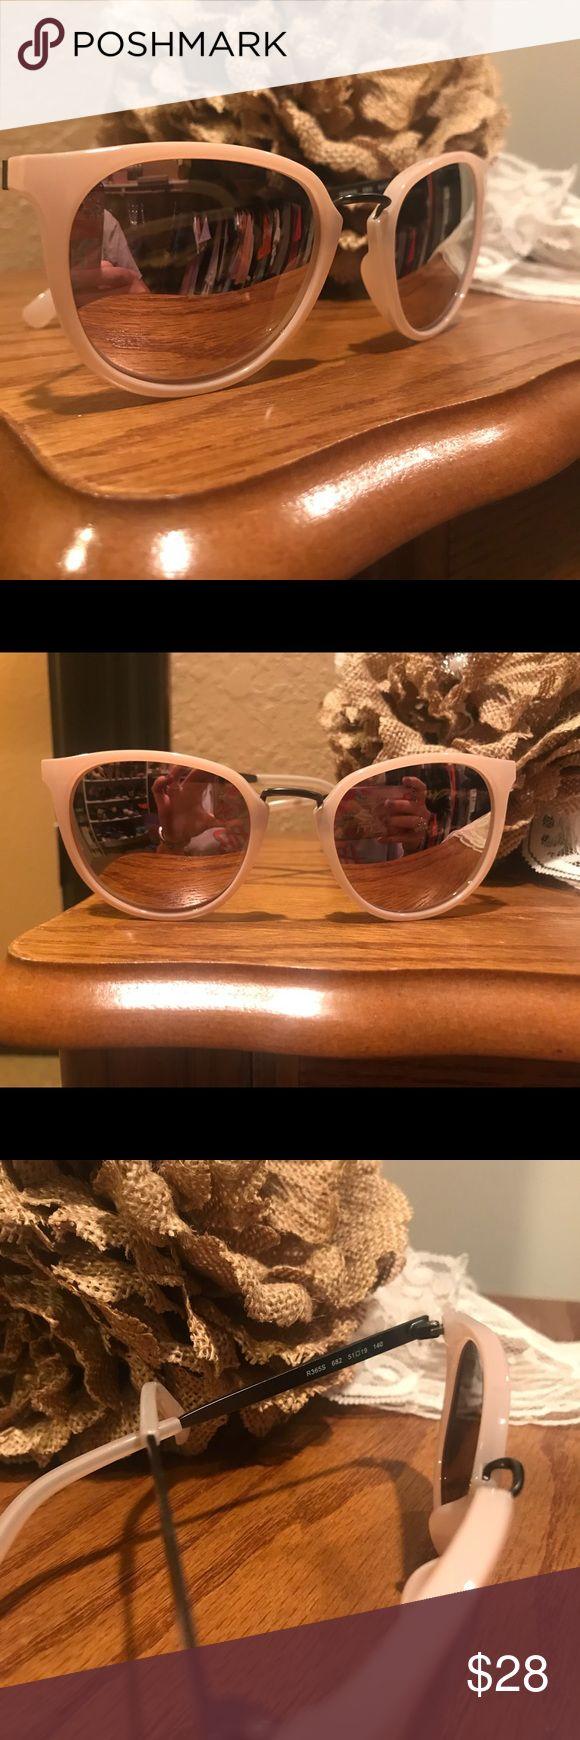 NWOT Calvin Klein Sunglasses for Women! Beautiful cateye light pink sunglasses. NWOT. Never been worn. Calvin Klein Accessories Sunglasses